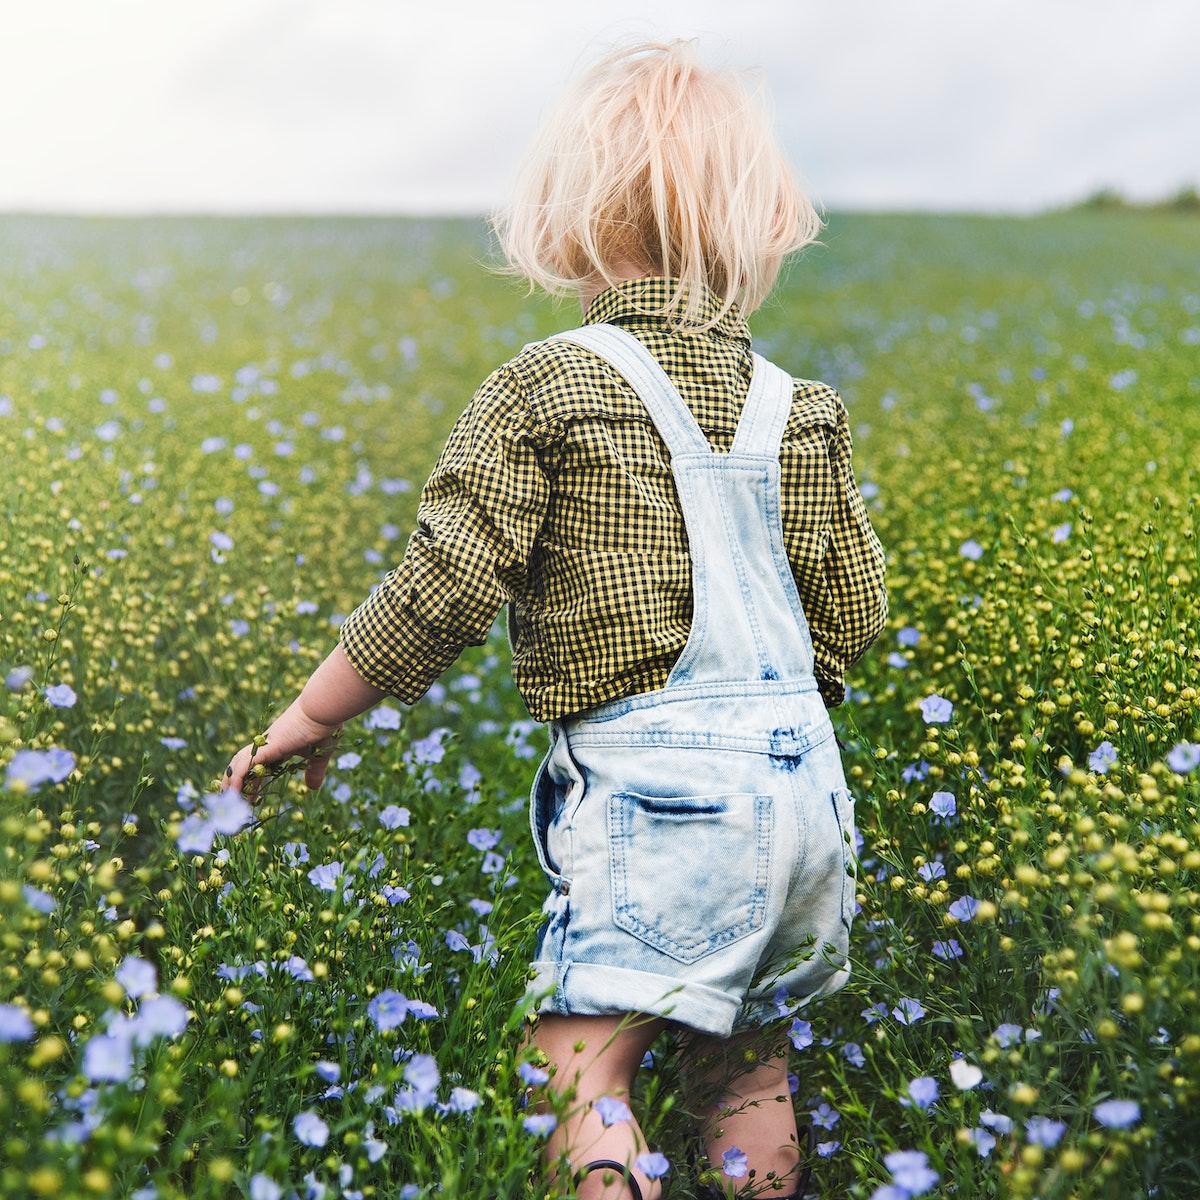 Kid in the garden